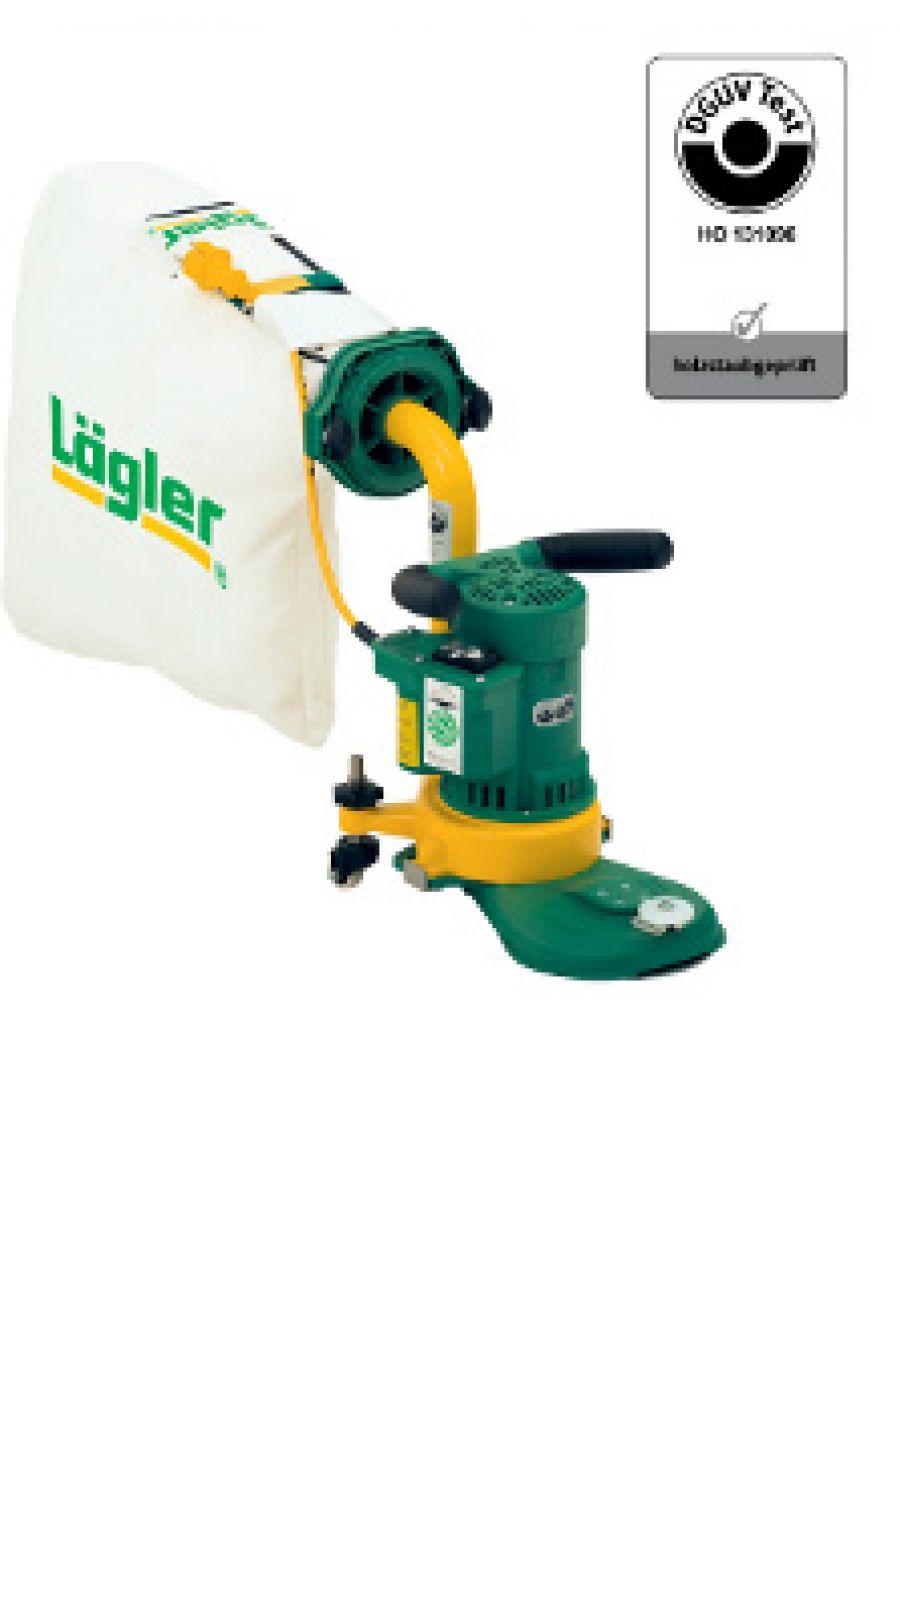 Lagler Sander Machines Parts Rm Wood Floor Supplies